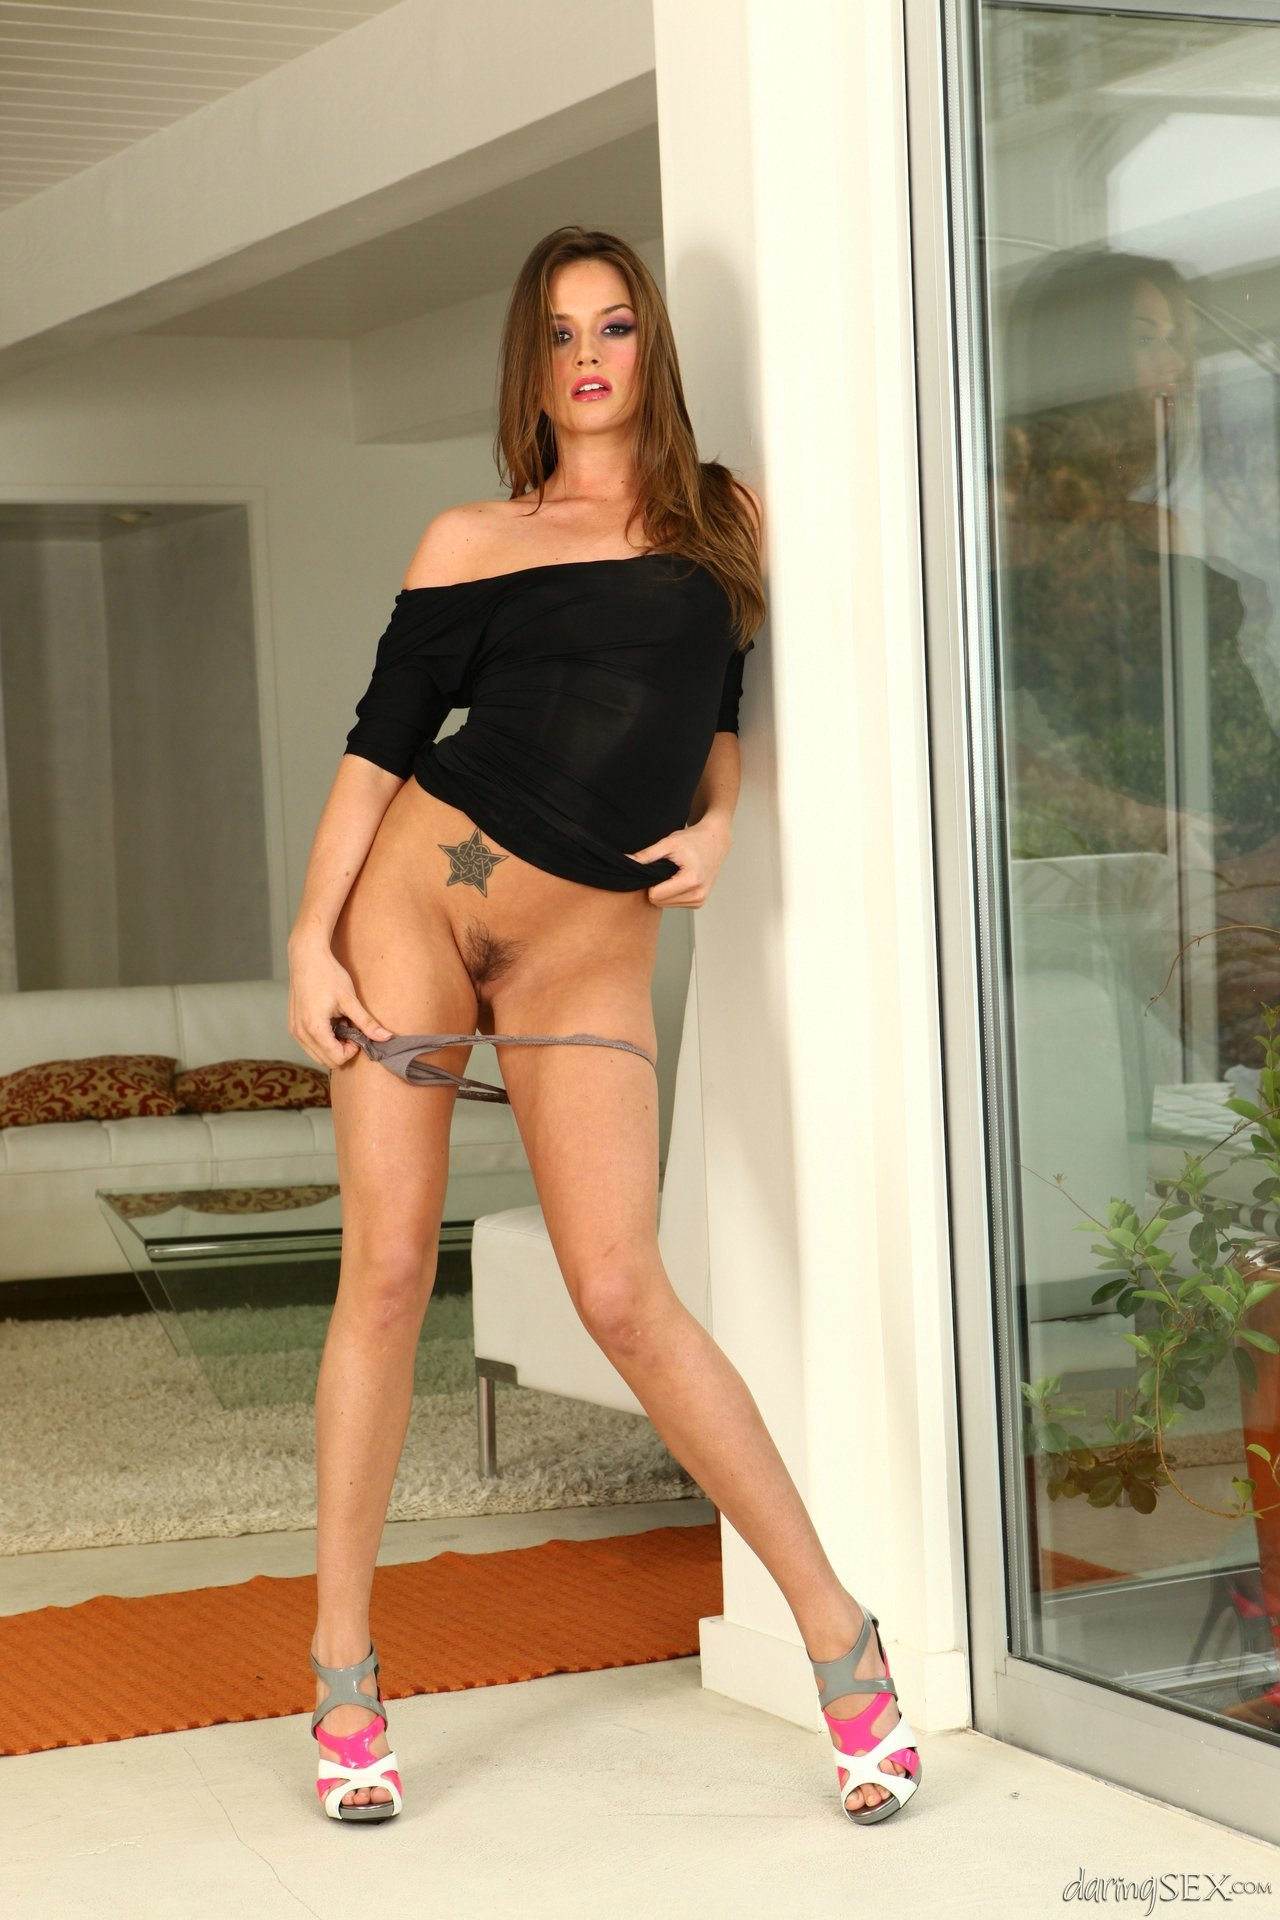 Tori Black Strips Off Her Sexy Short Black Dress - My -4689